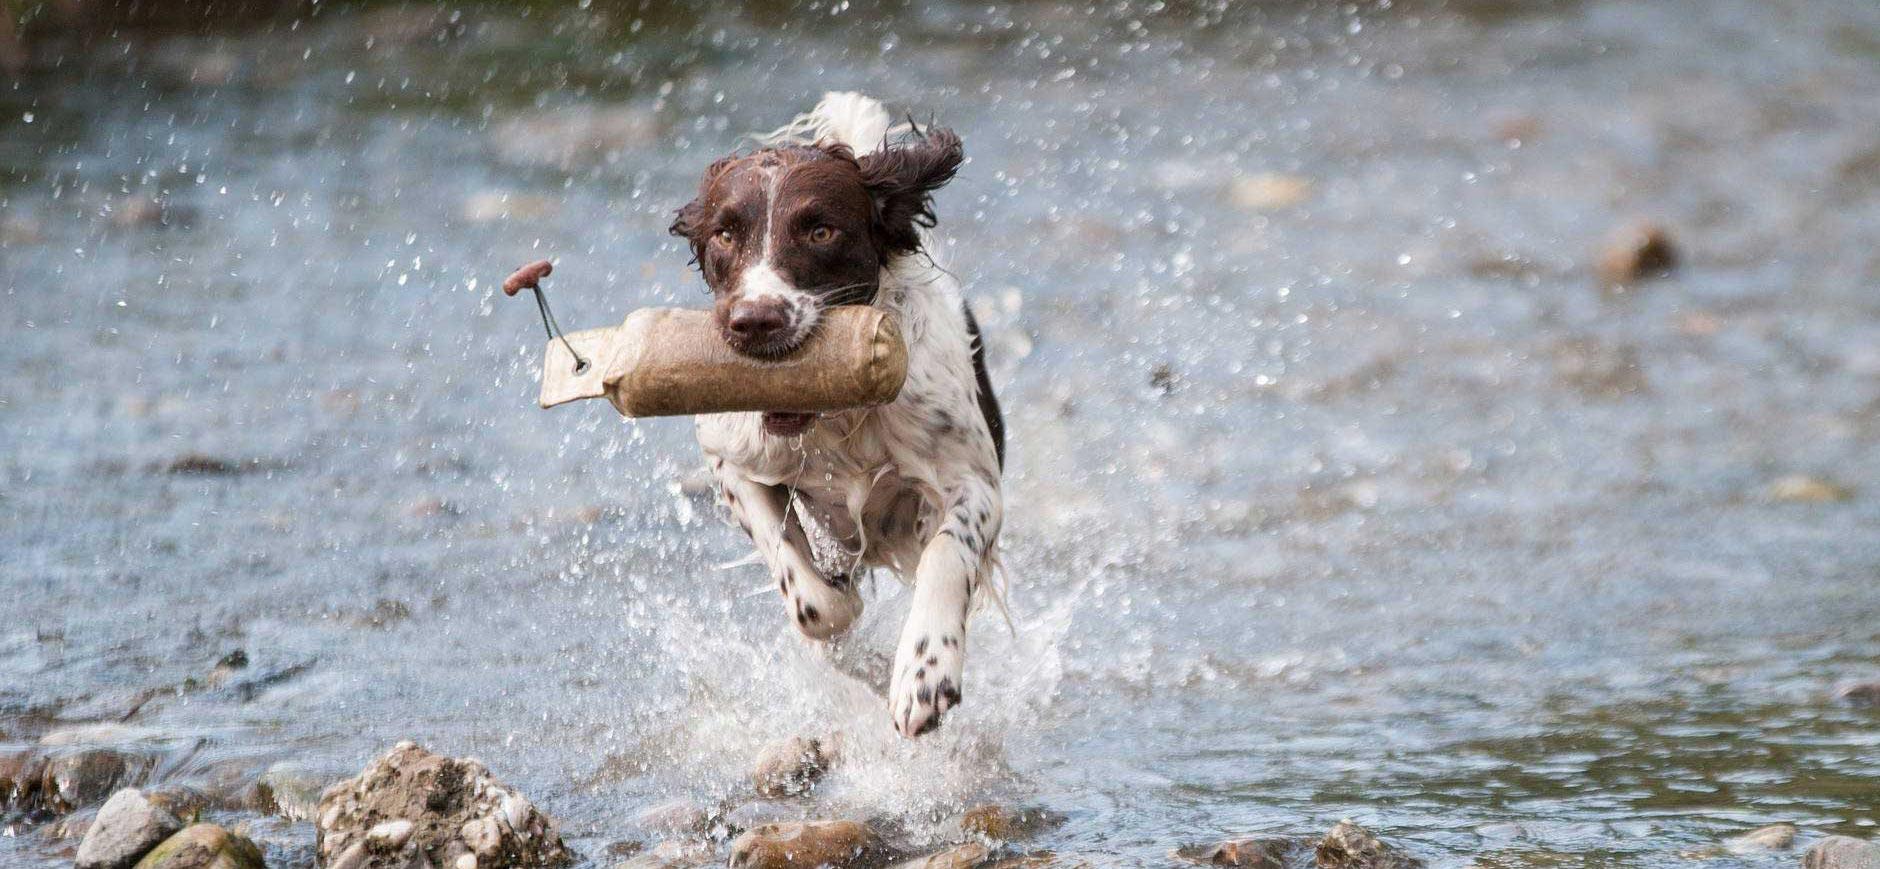 Gundog spaniel retrieving a dummy through water